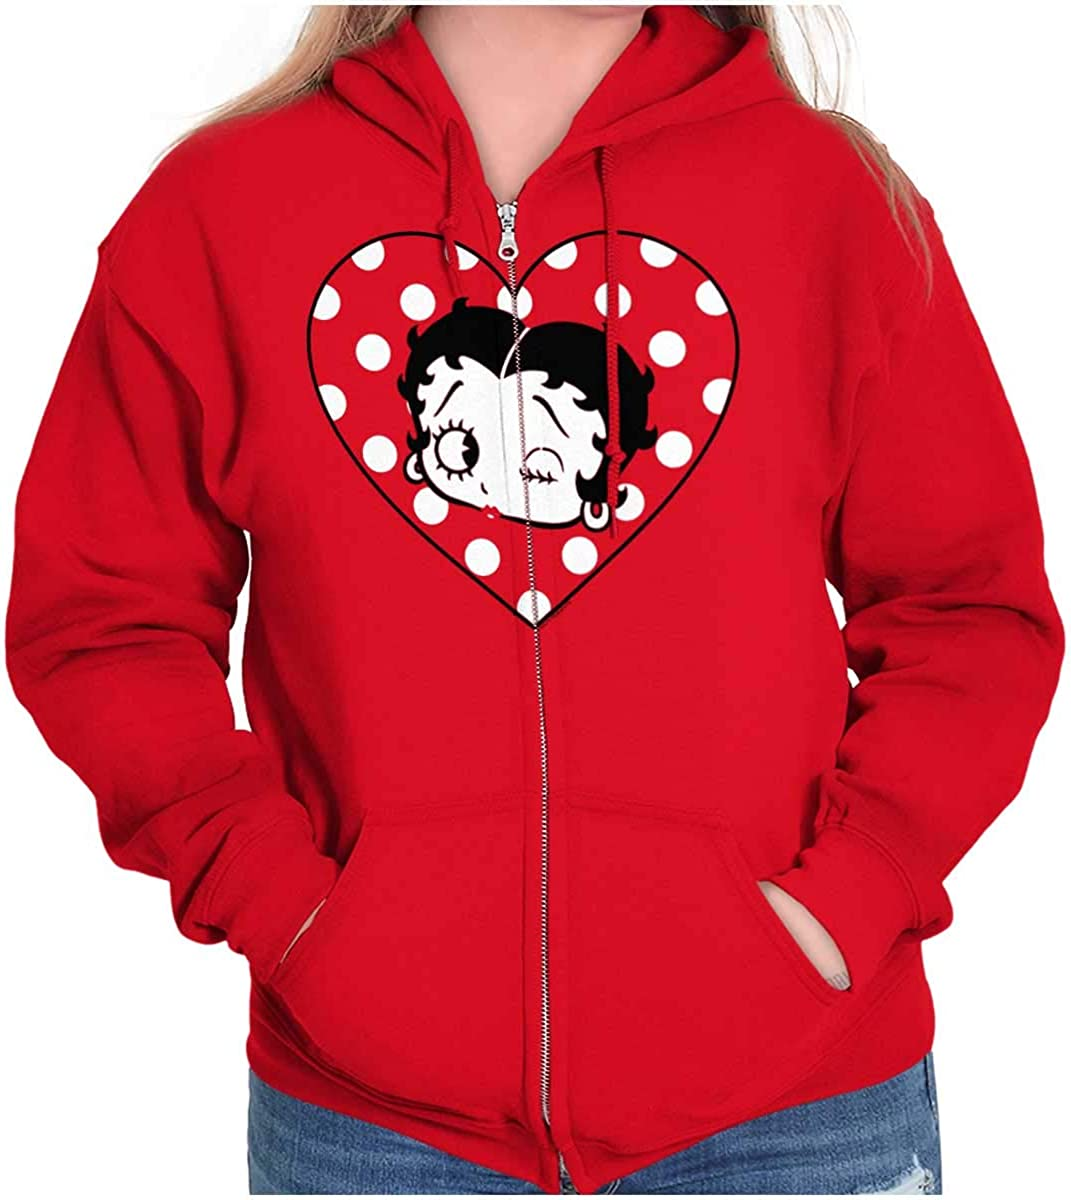 Betty Boop Wink and a Kiss Polka Dots Zip Hoodie Sweatshirt Wome